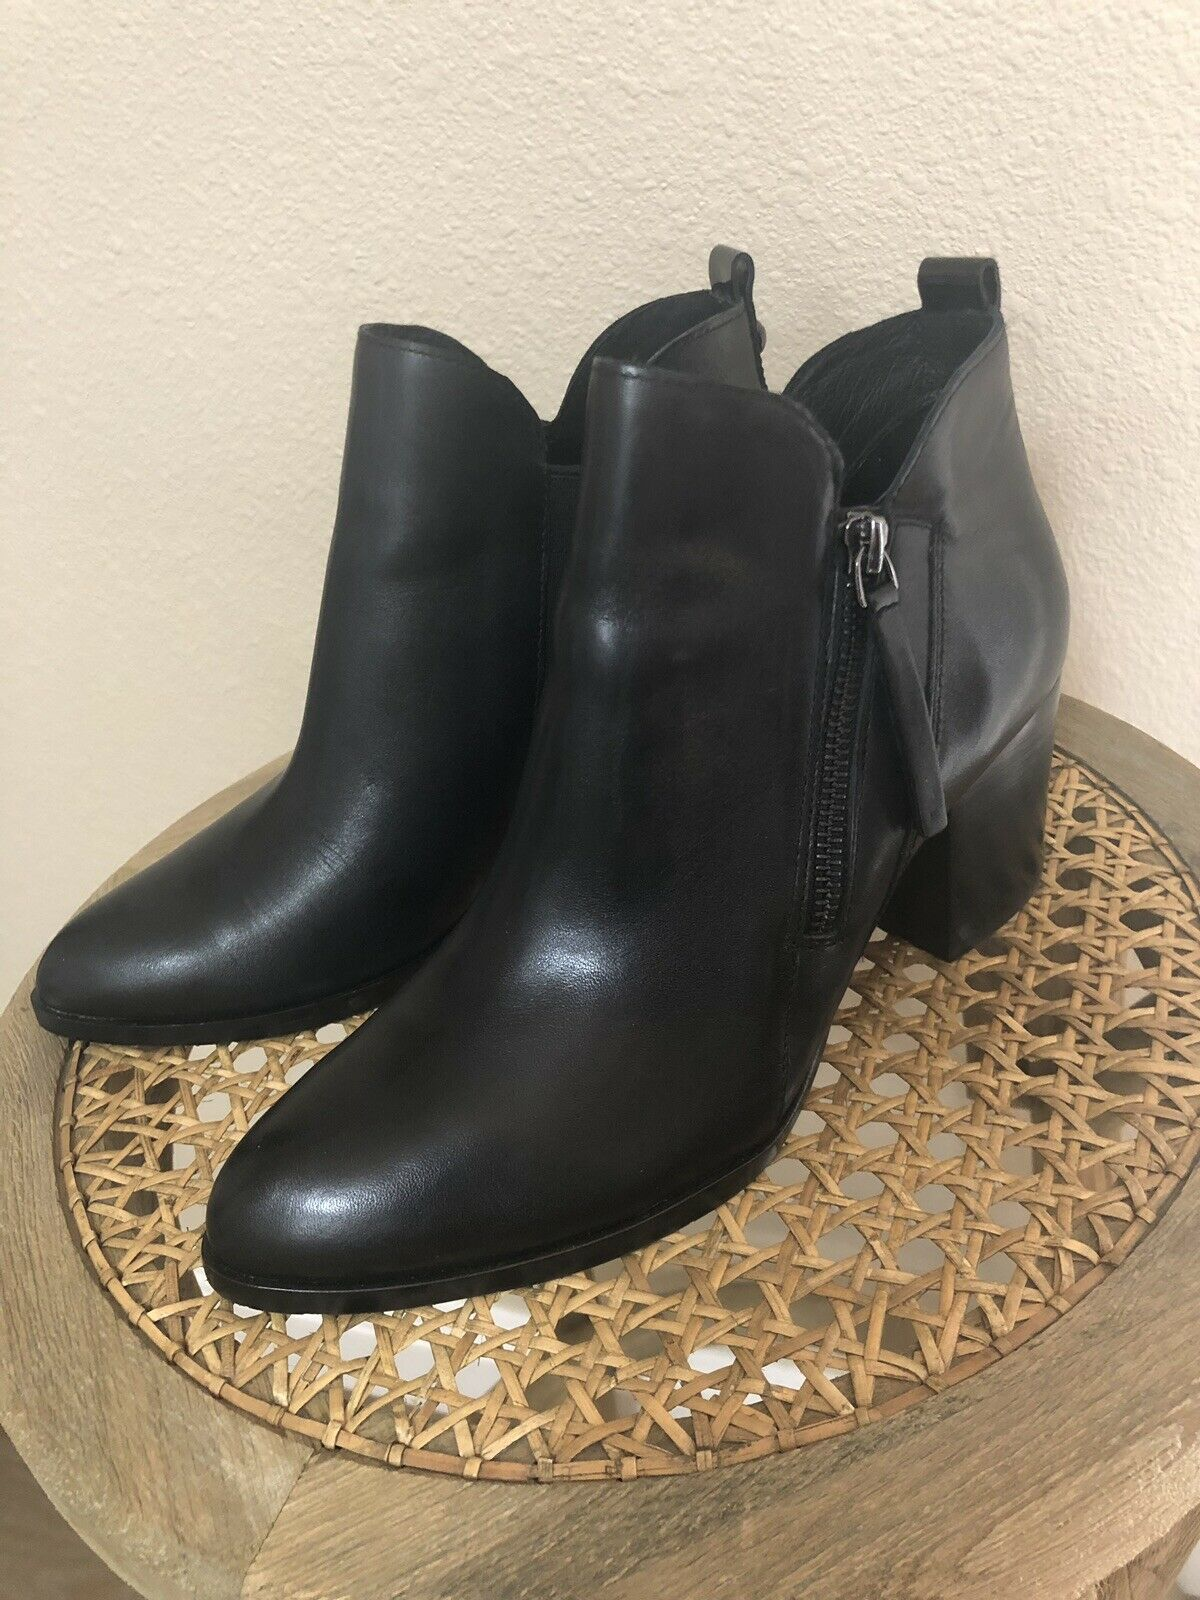 Donald Pliner Edyn Black Ankle Boot Bootie 6.5